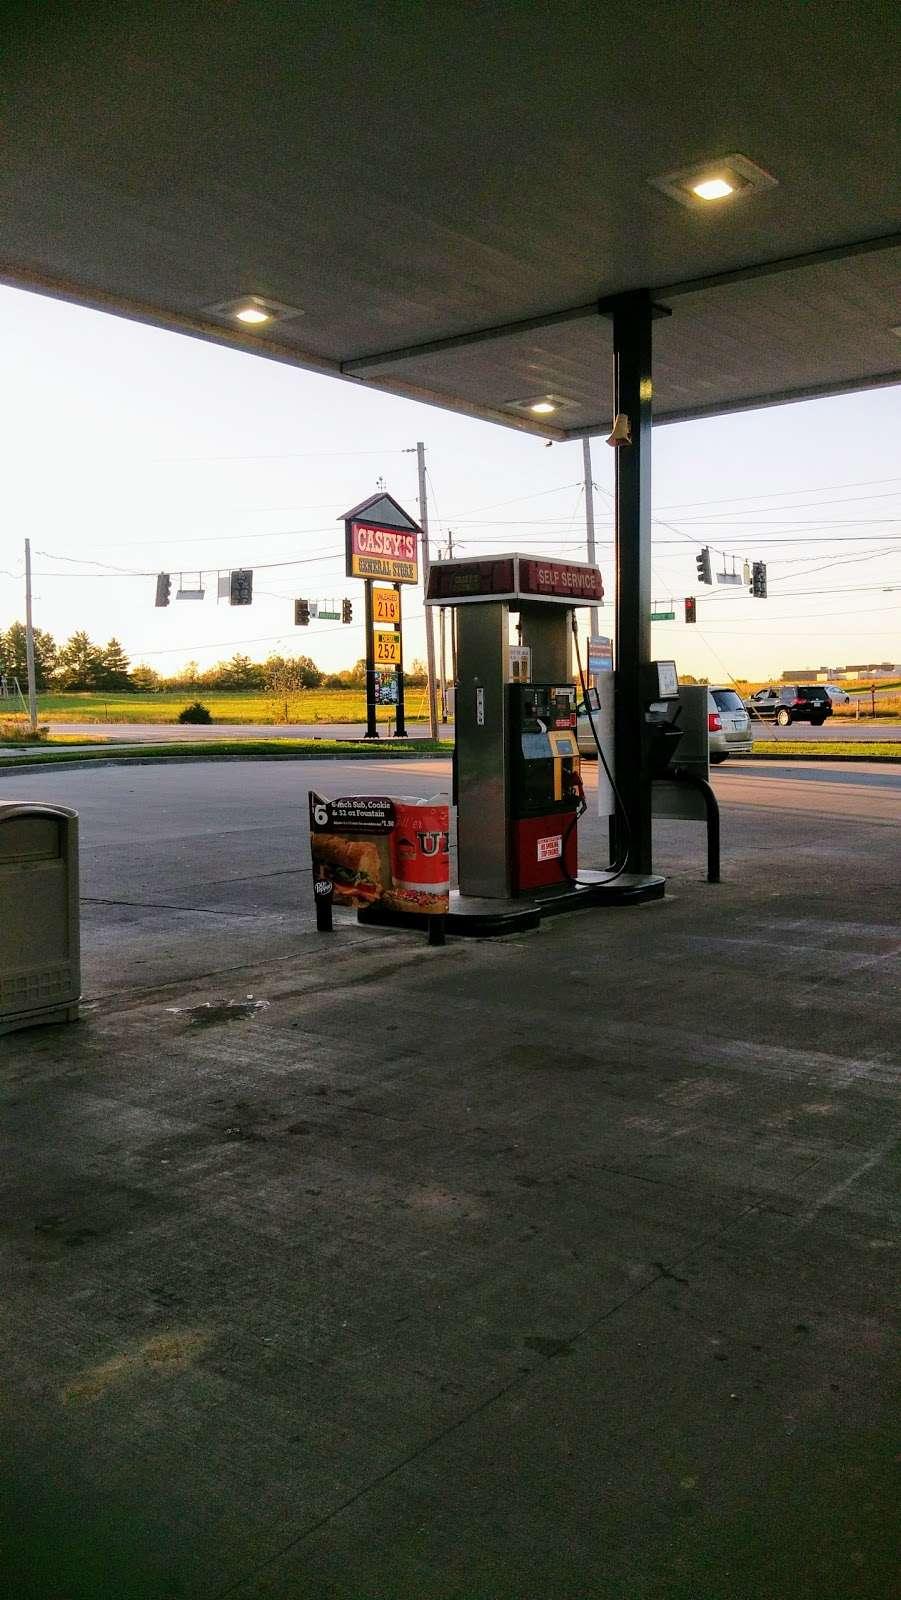 Caseys - gas station  | Photo 6 of 10 | Address: 1118 S Ridgeview Dr, Warrensburg, MO 64093, USA | Phone: (660) 747-6744